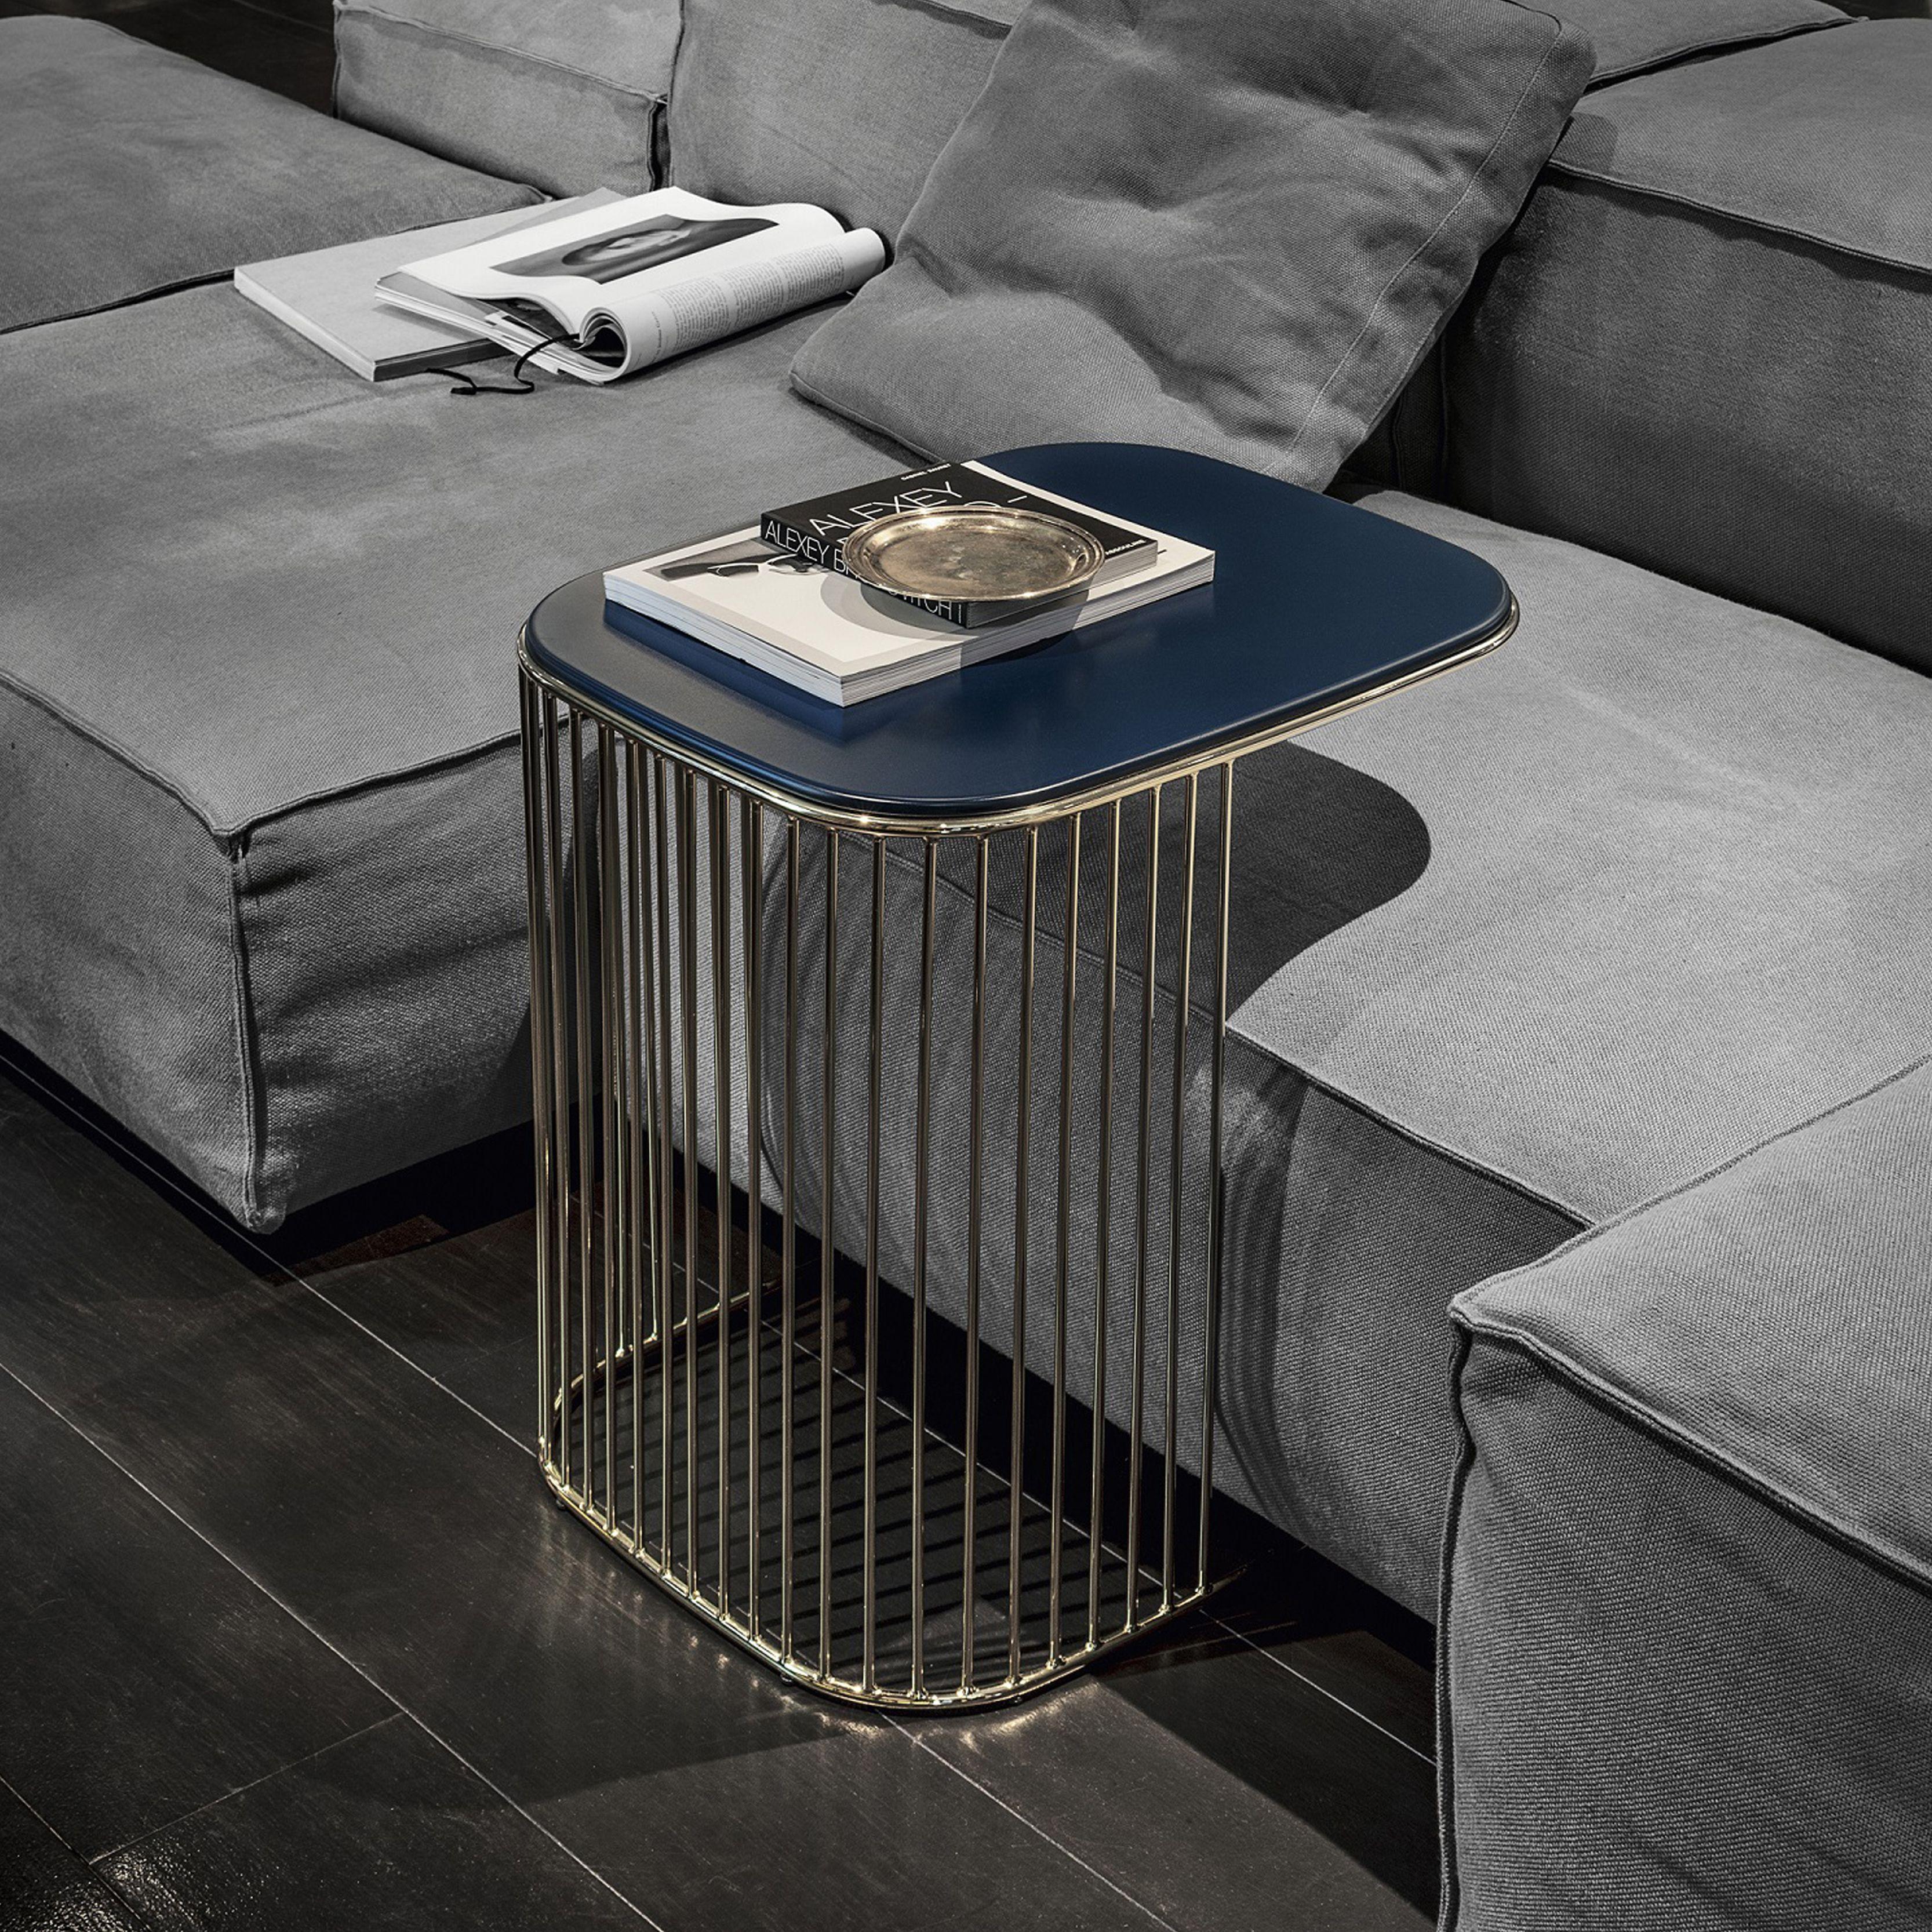 Premium Italian Furniture Brands In India Vivono Brings Luxury Italian Furniture Brands Includes Rim Italian Furniture Brands Retro Coffee Tables Coffee Table [ 3333 x 3333 Pixel ]